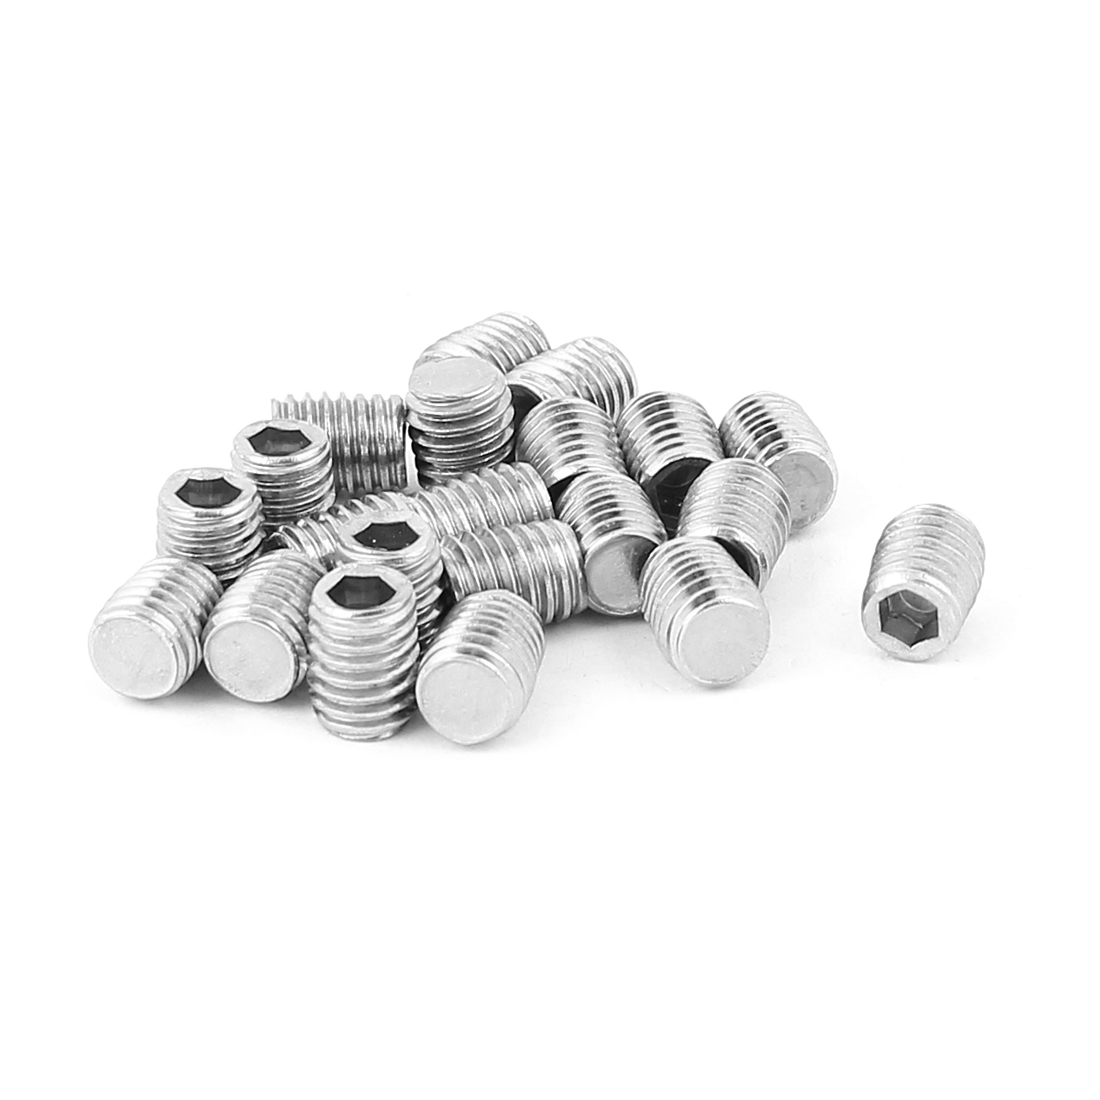 Stainless Steel M8 x 10mm Hex Drive Socket Set Screw Nuts 20pcs